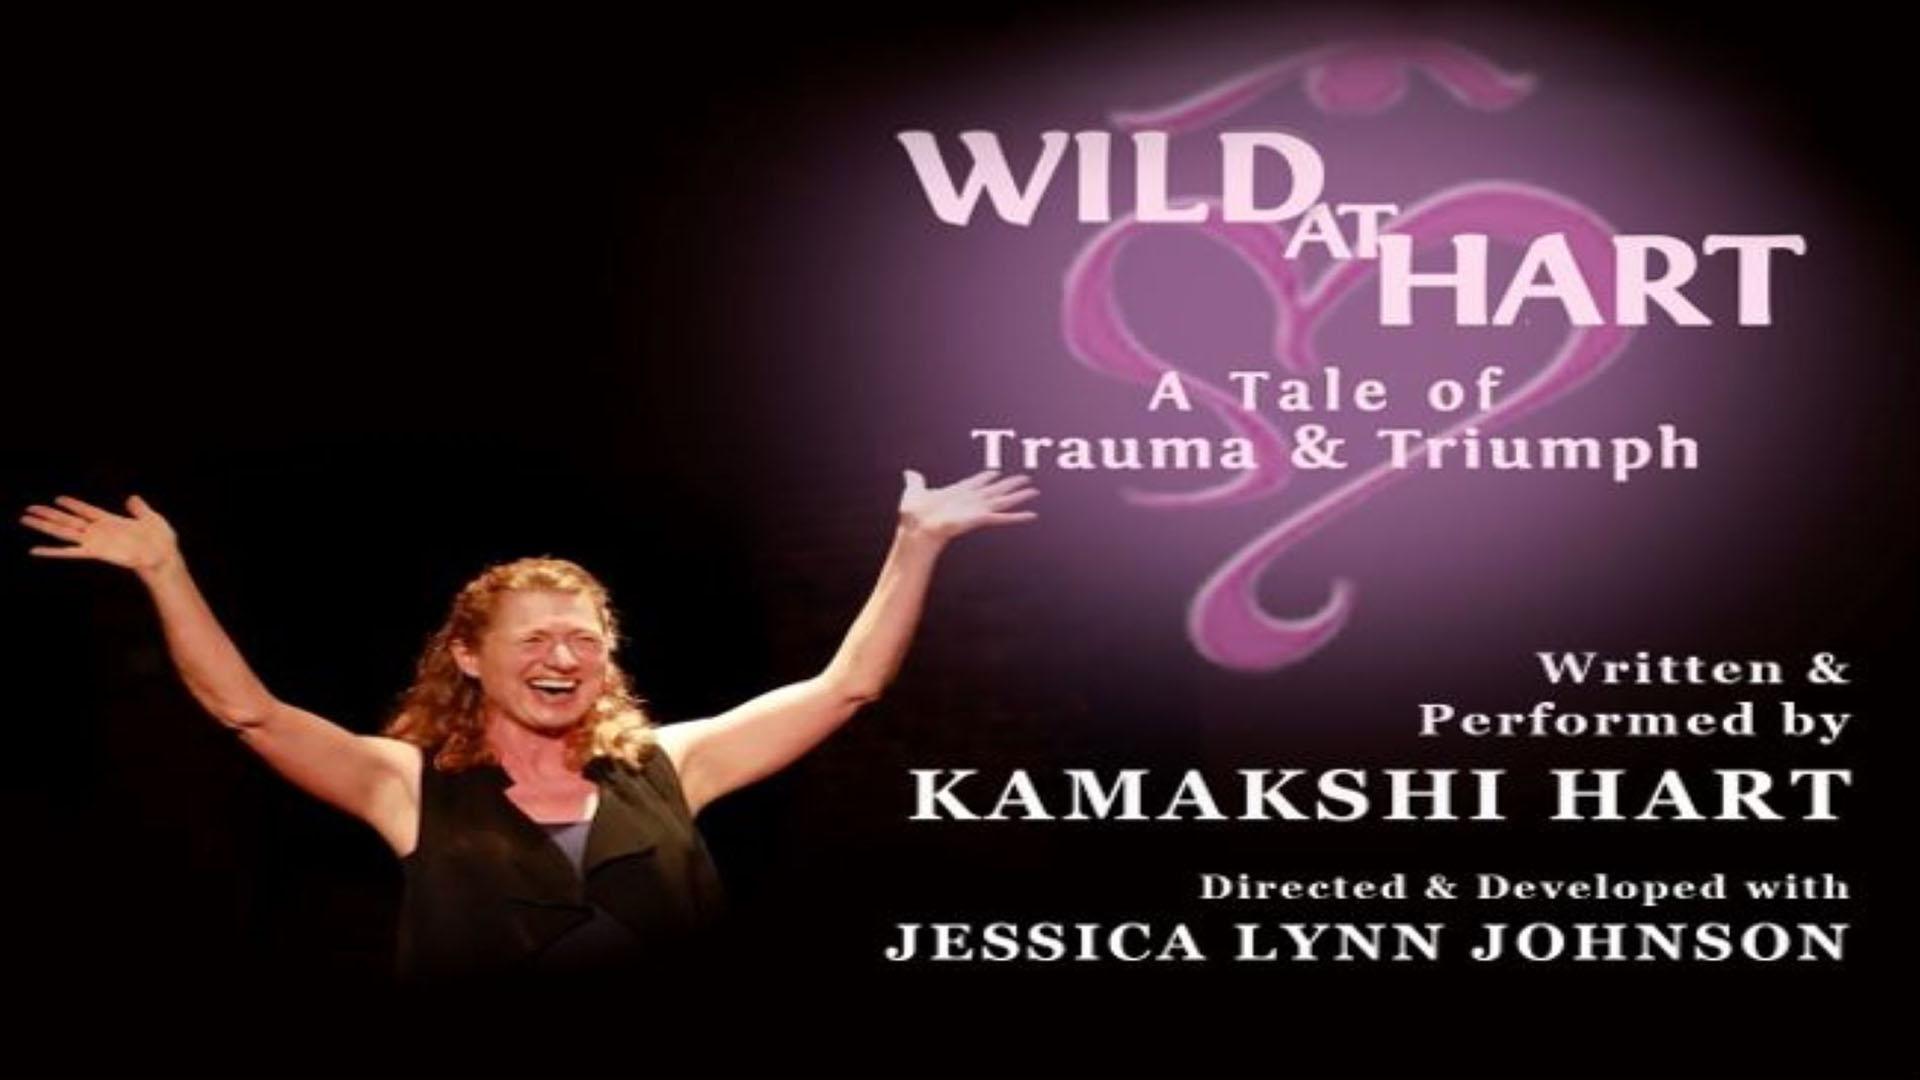 Wild At Hart Feb 26 @ 7pm PST